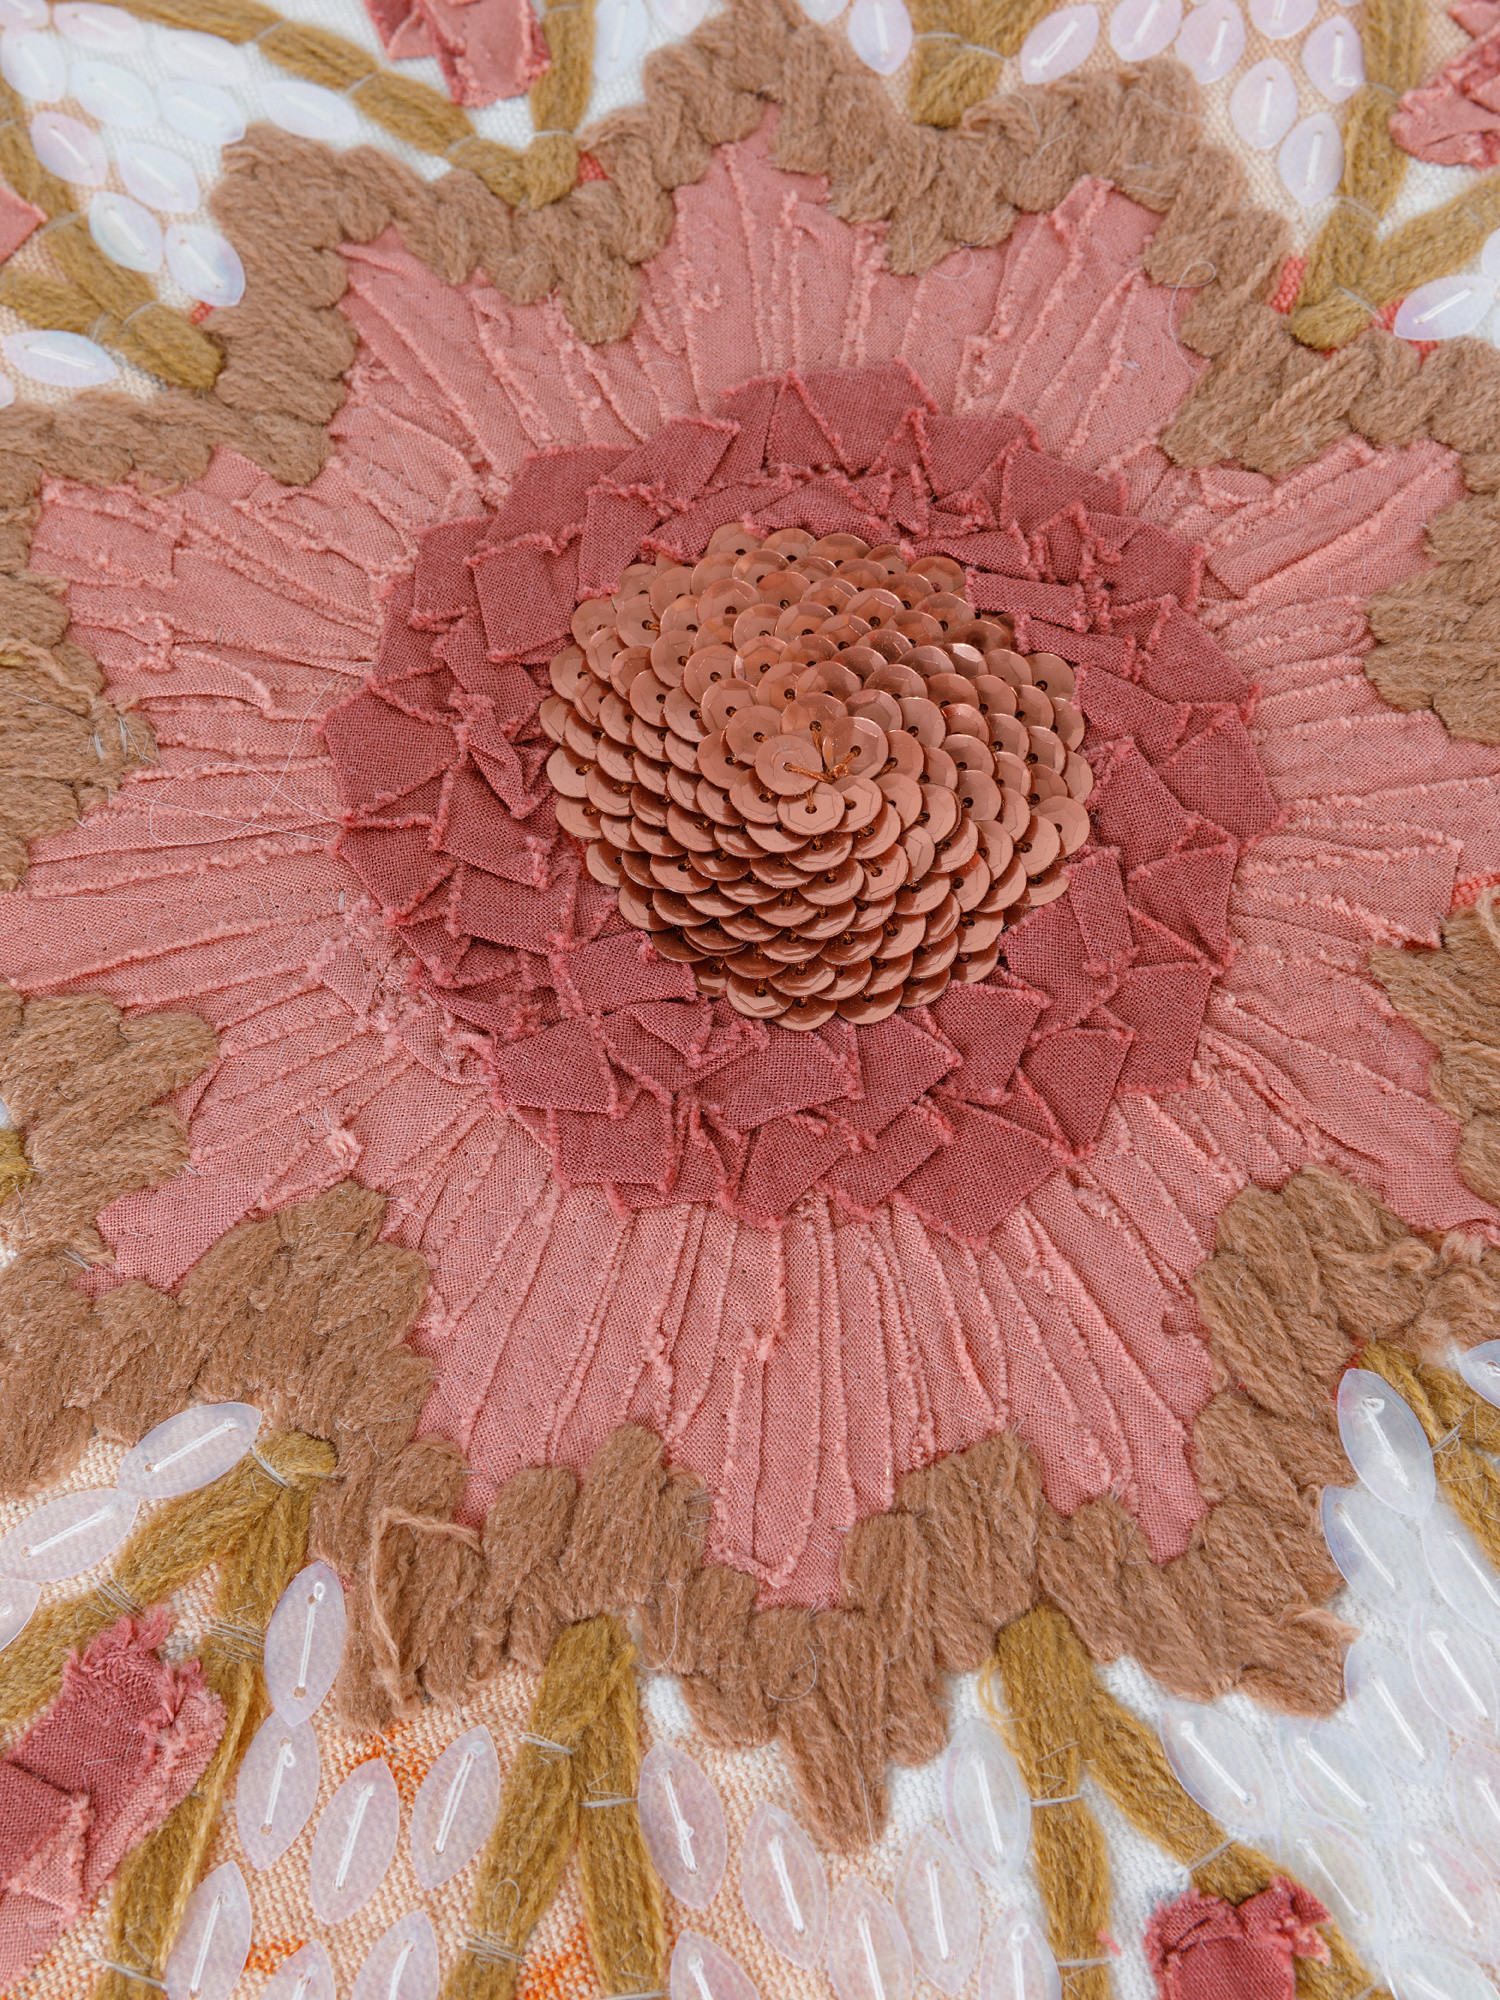 Cuscino cotone effetto tie dye 45x45cm, Multicolor, large image number 2